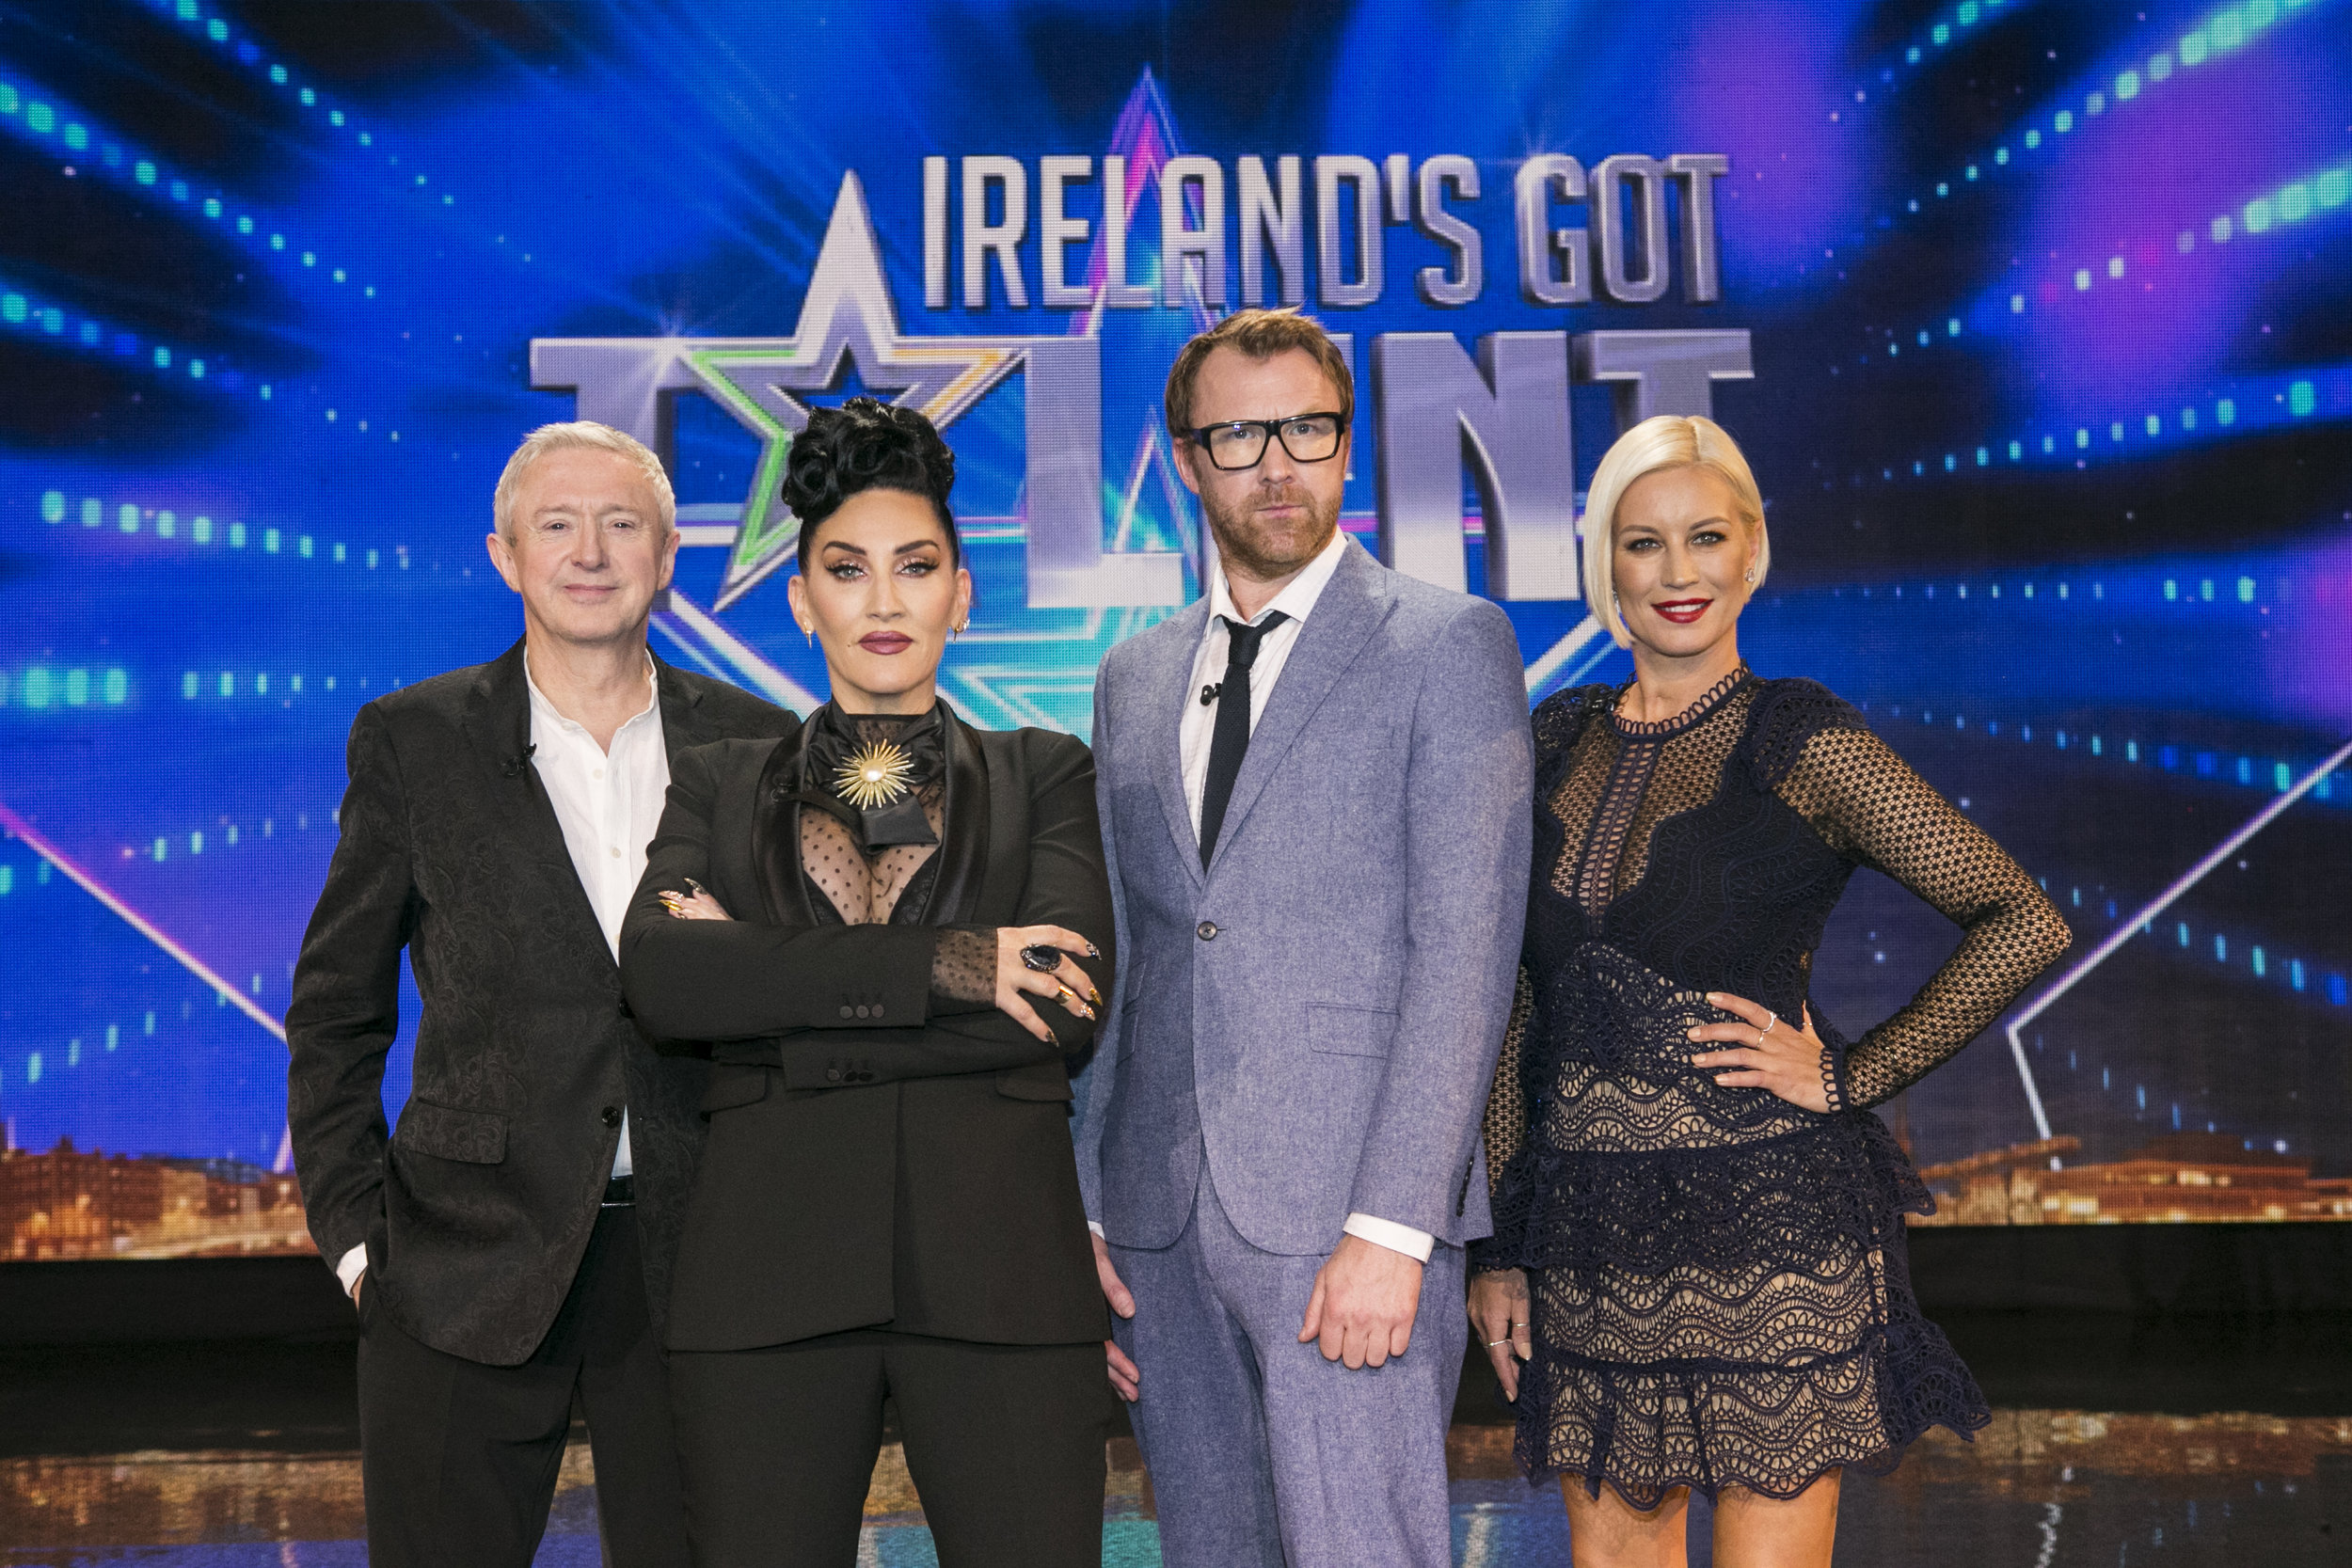 Irelands Got Talent Judges Louis, Michelle, Jason and Denise.jpg